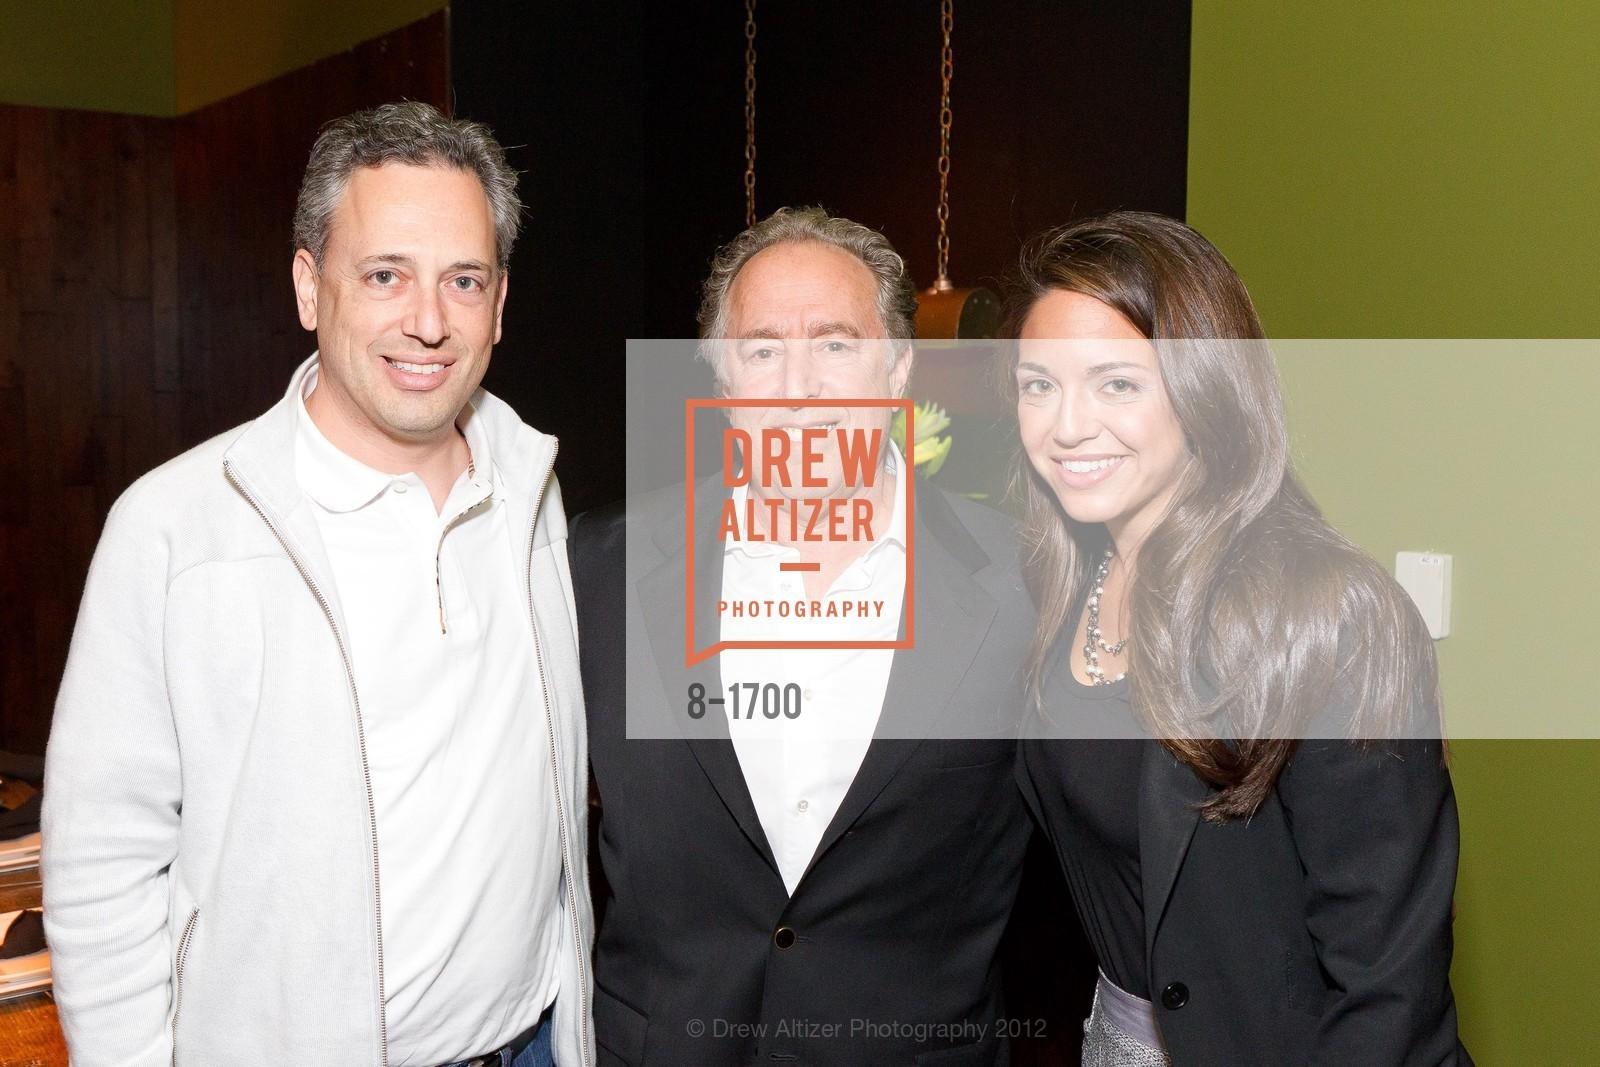 David Sacks, Steven Foster, Jacqueline Sacks, Photo #8-1700